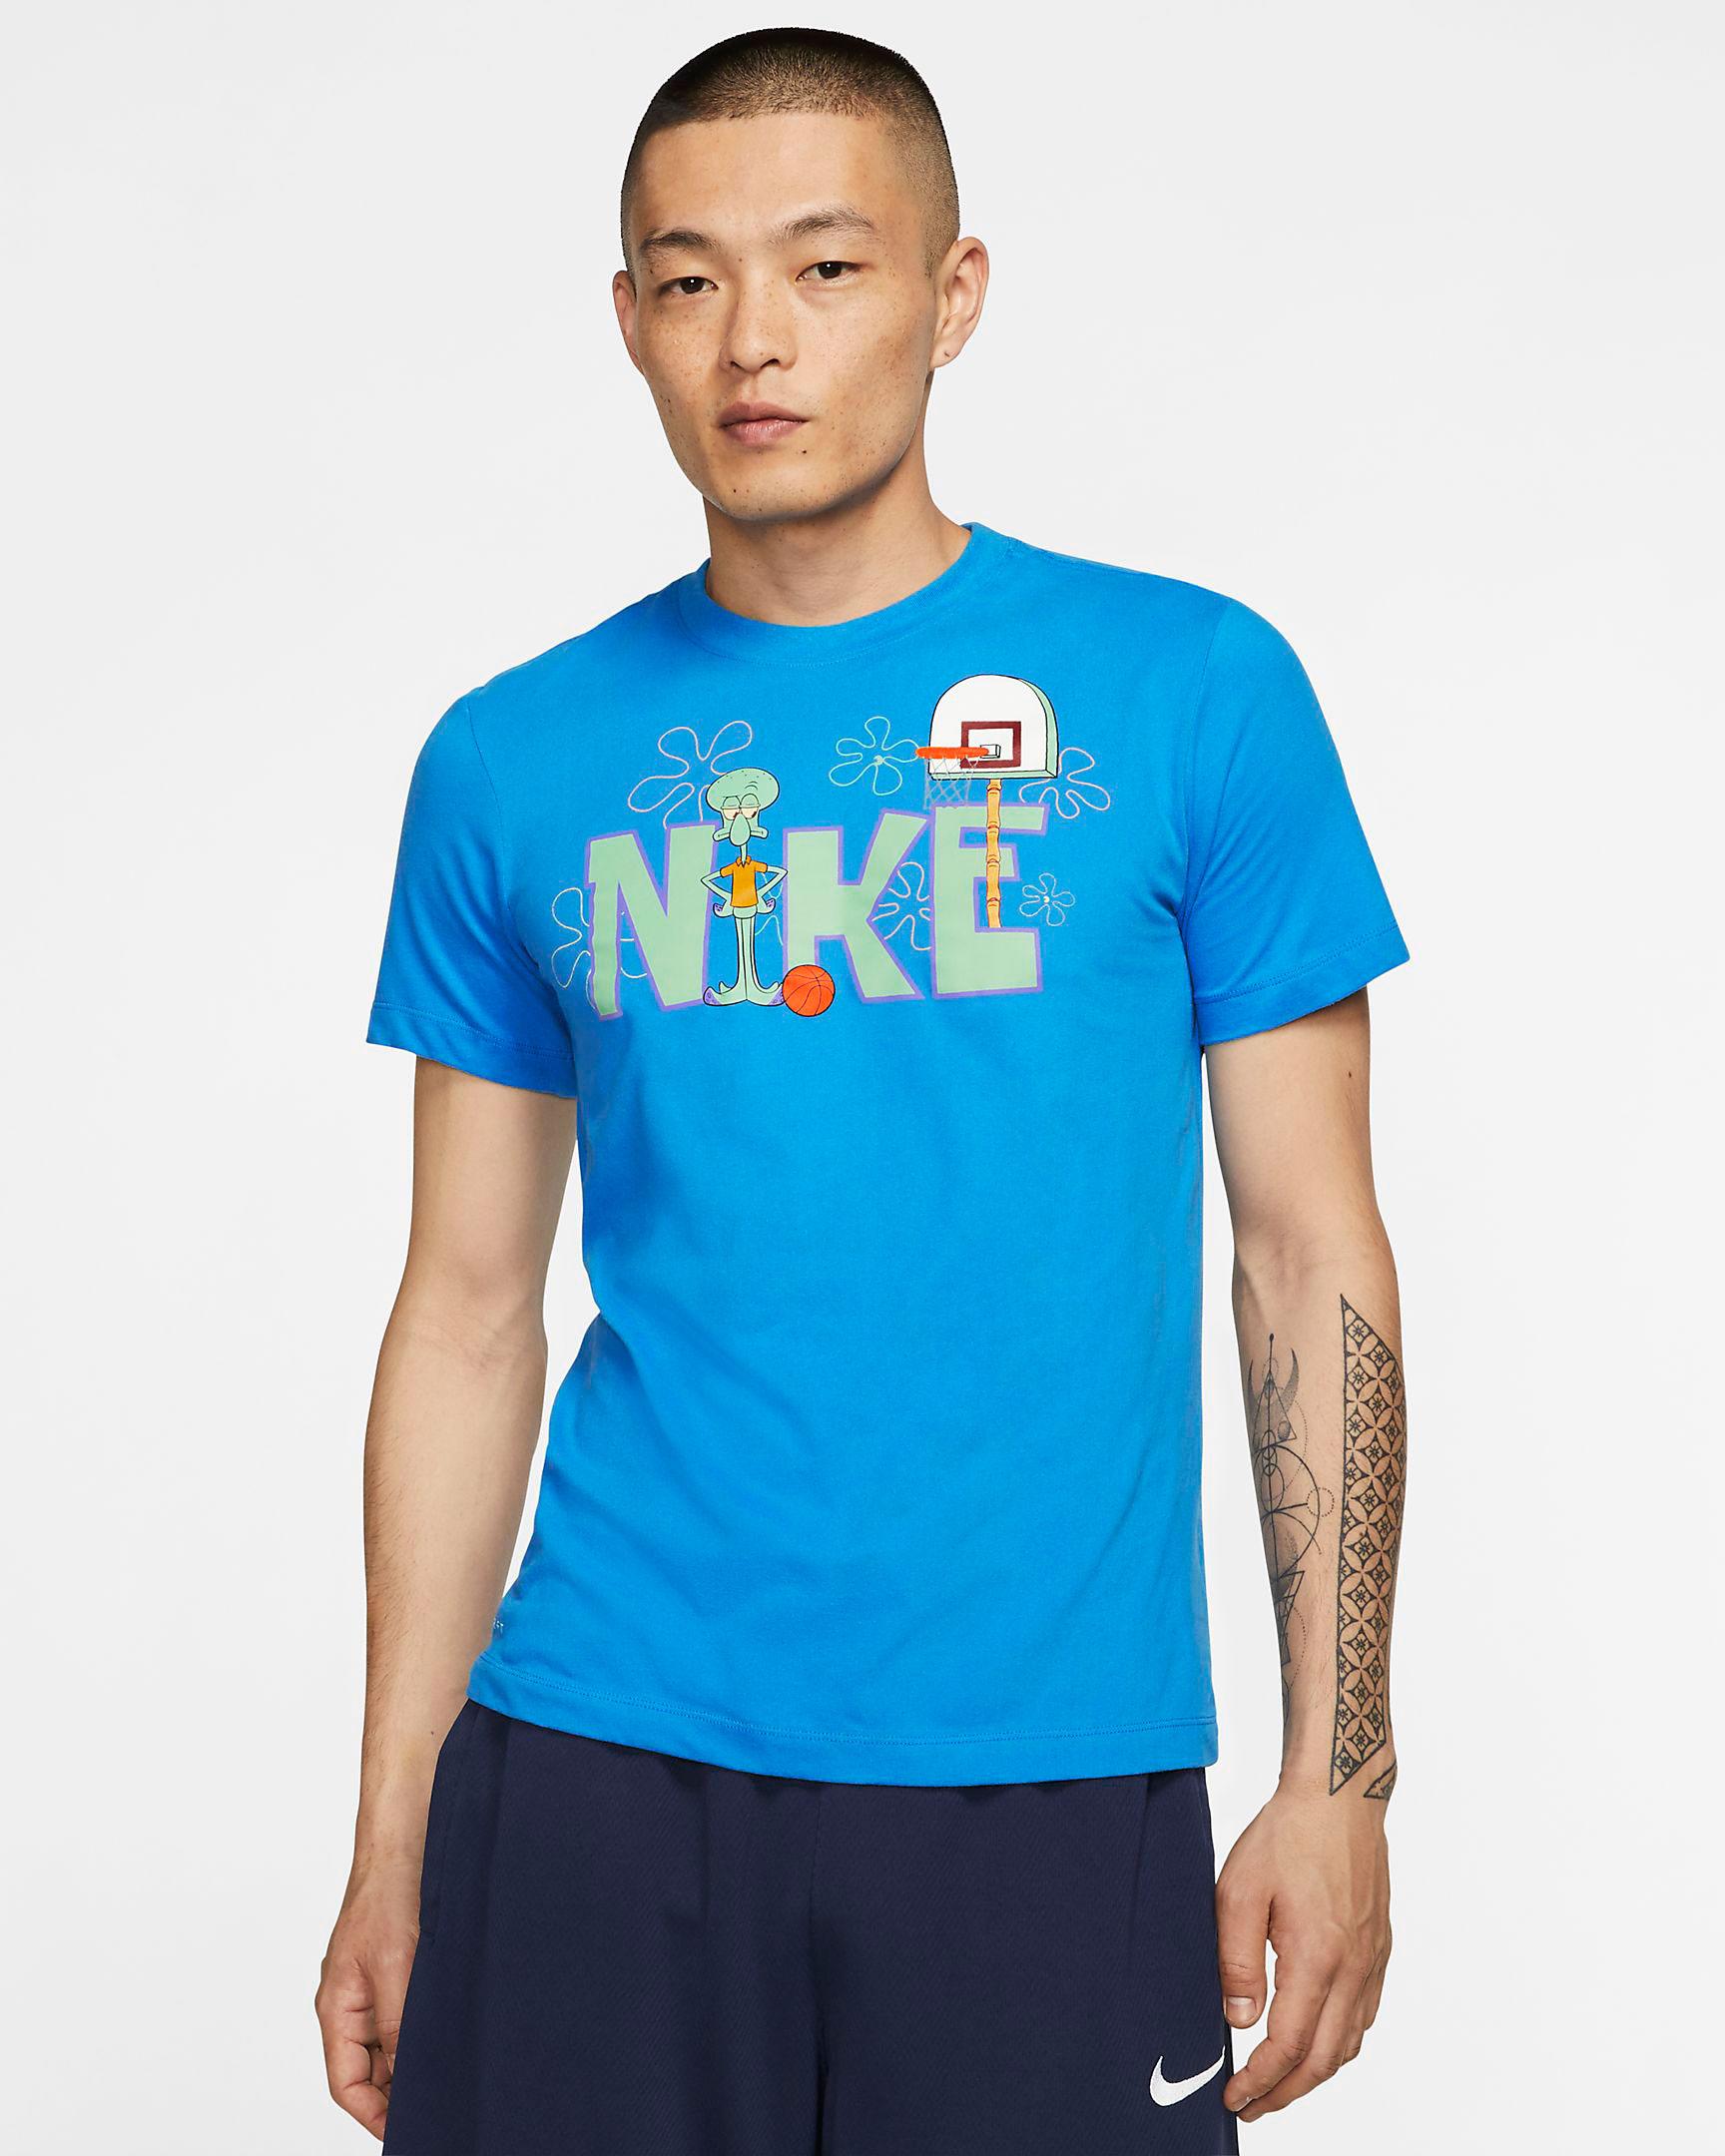 nike-kyrie-spongebob-squidward-tentacles-shirt-1